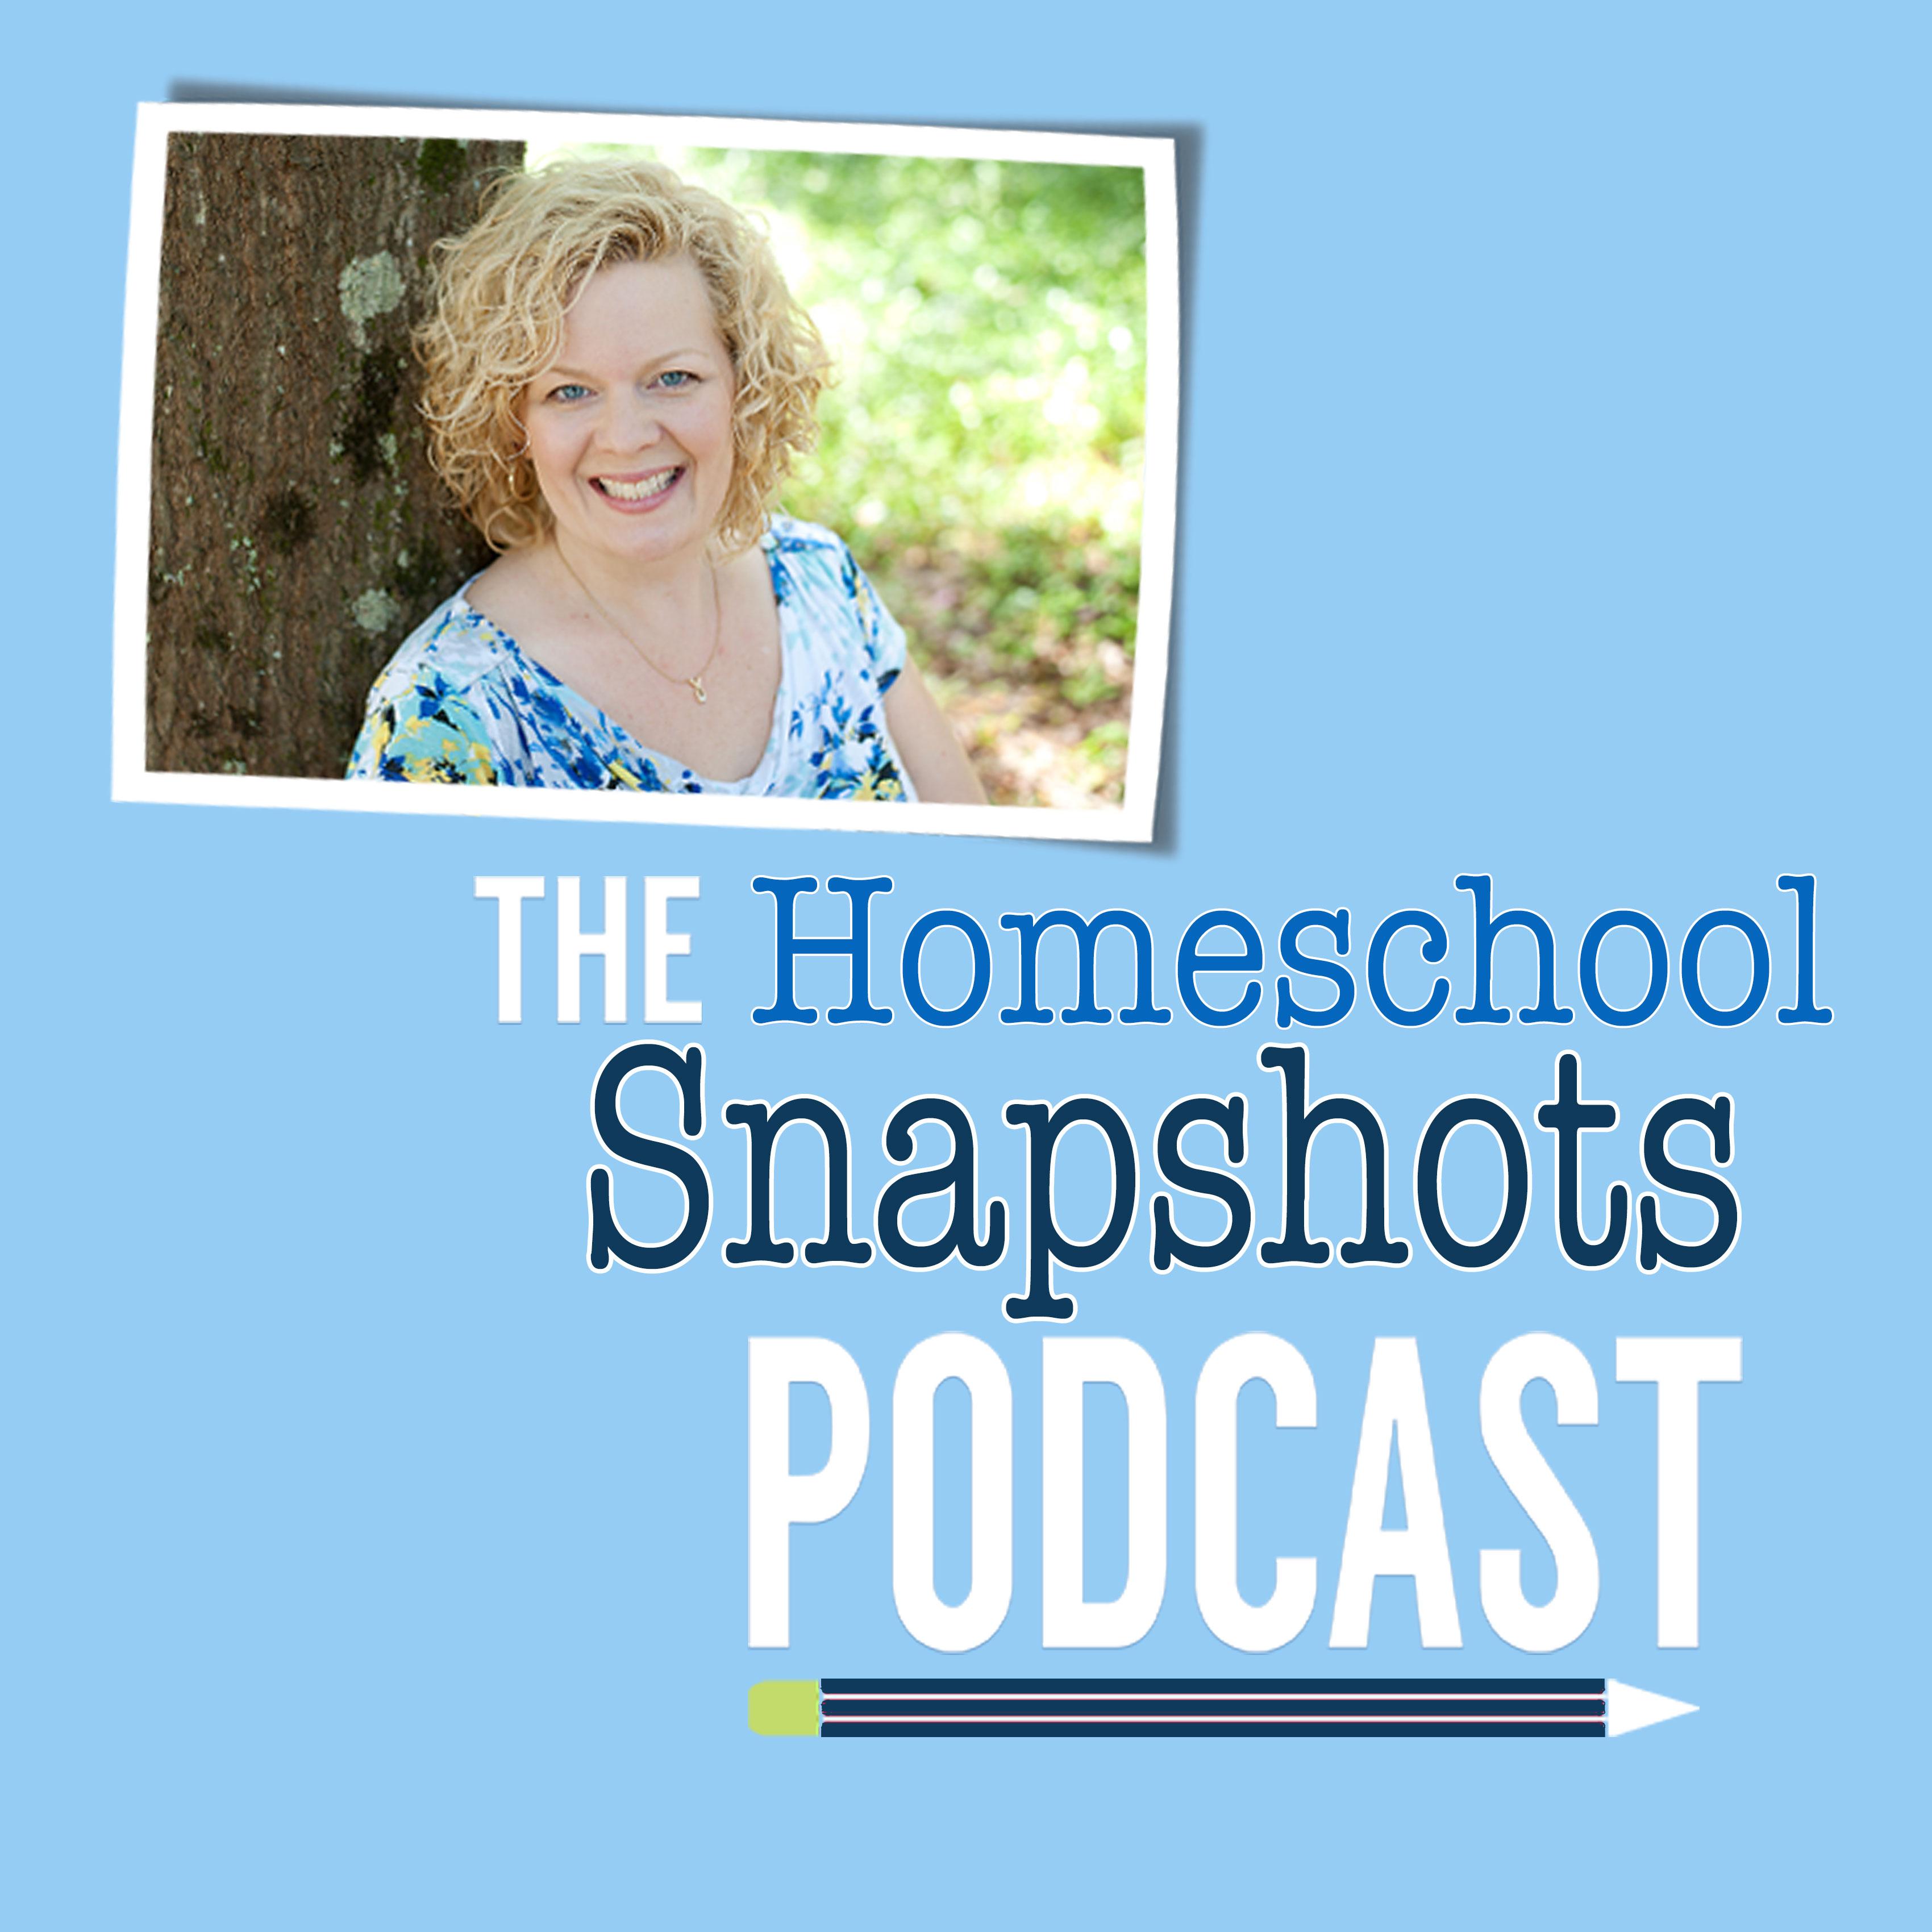 The Homeschool Snapshots Podcast